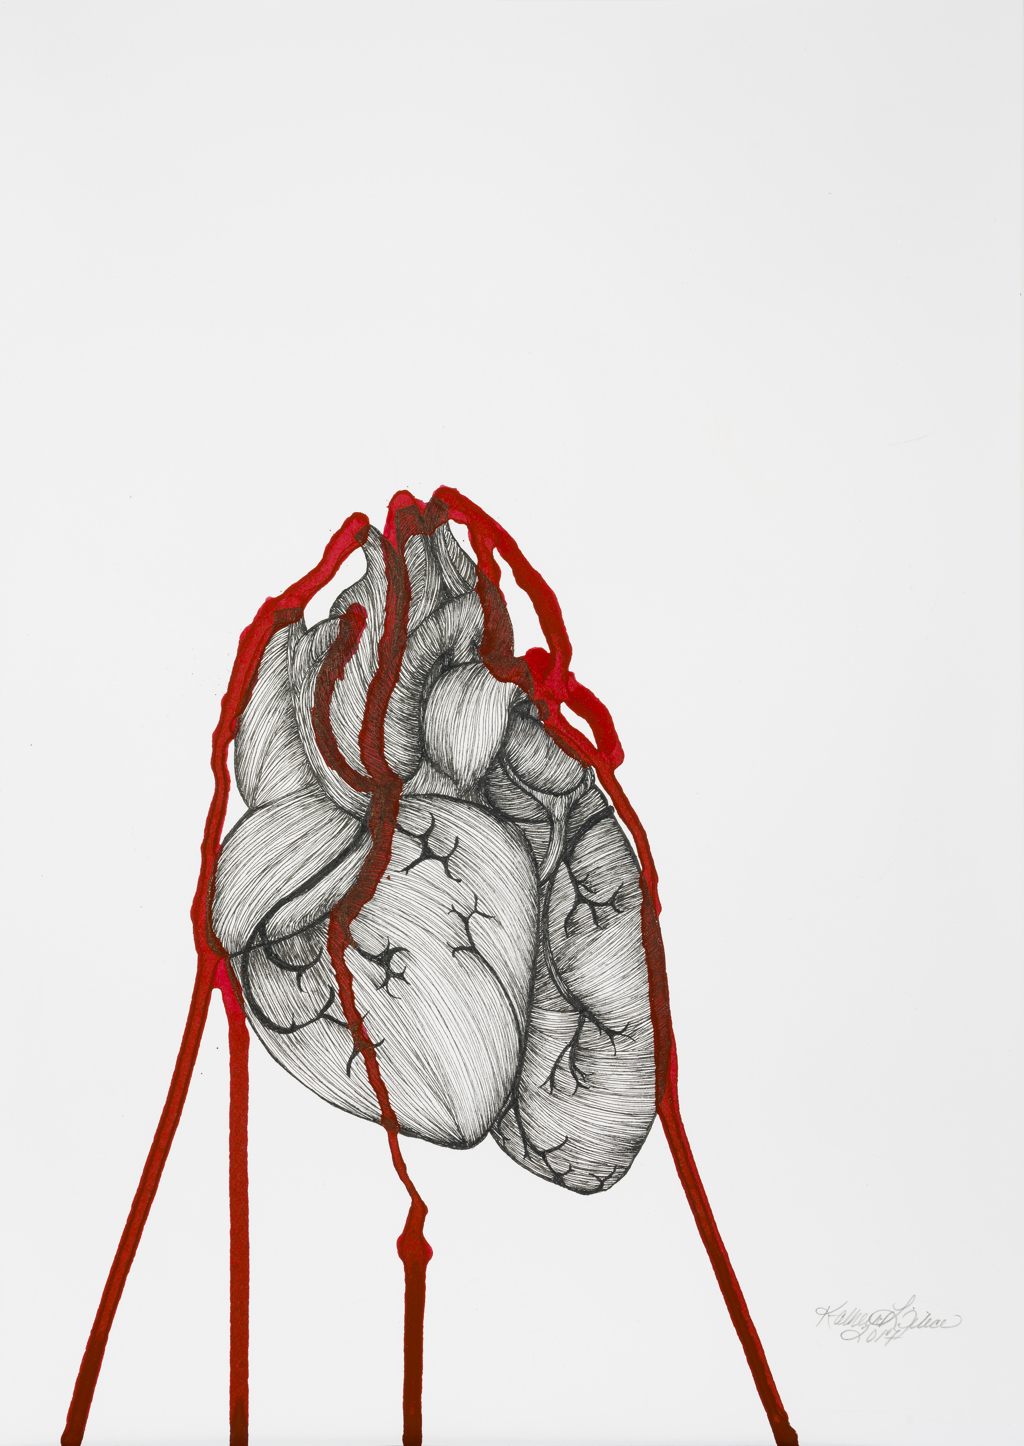 Heartbeat by Katherine Filice